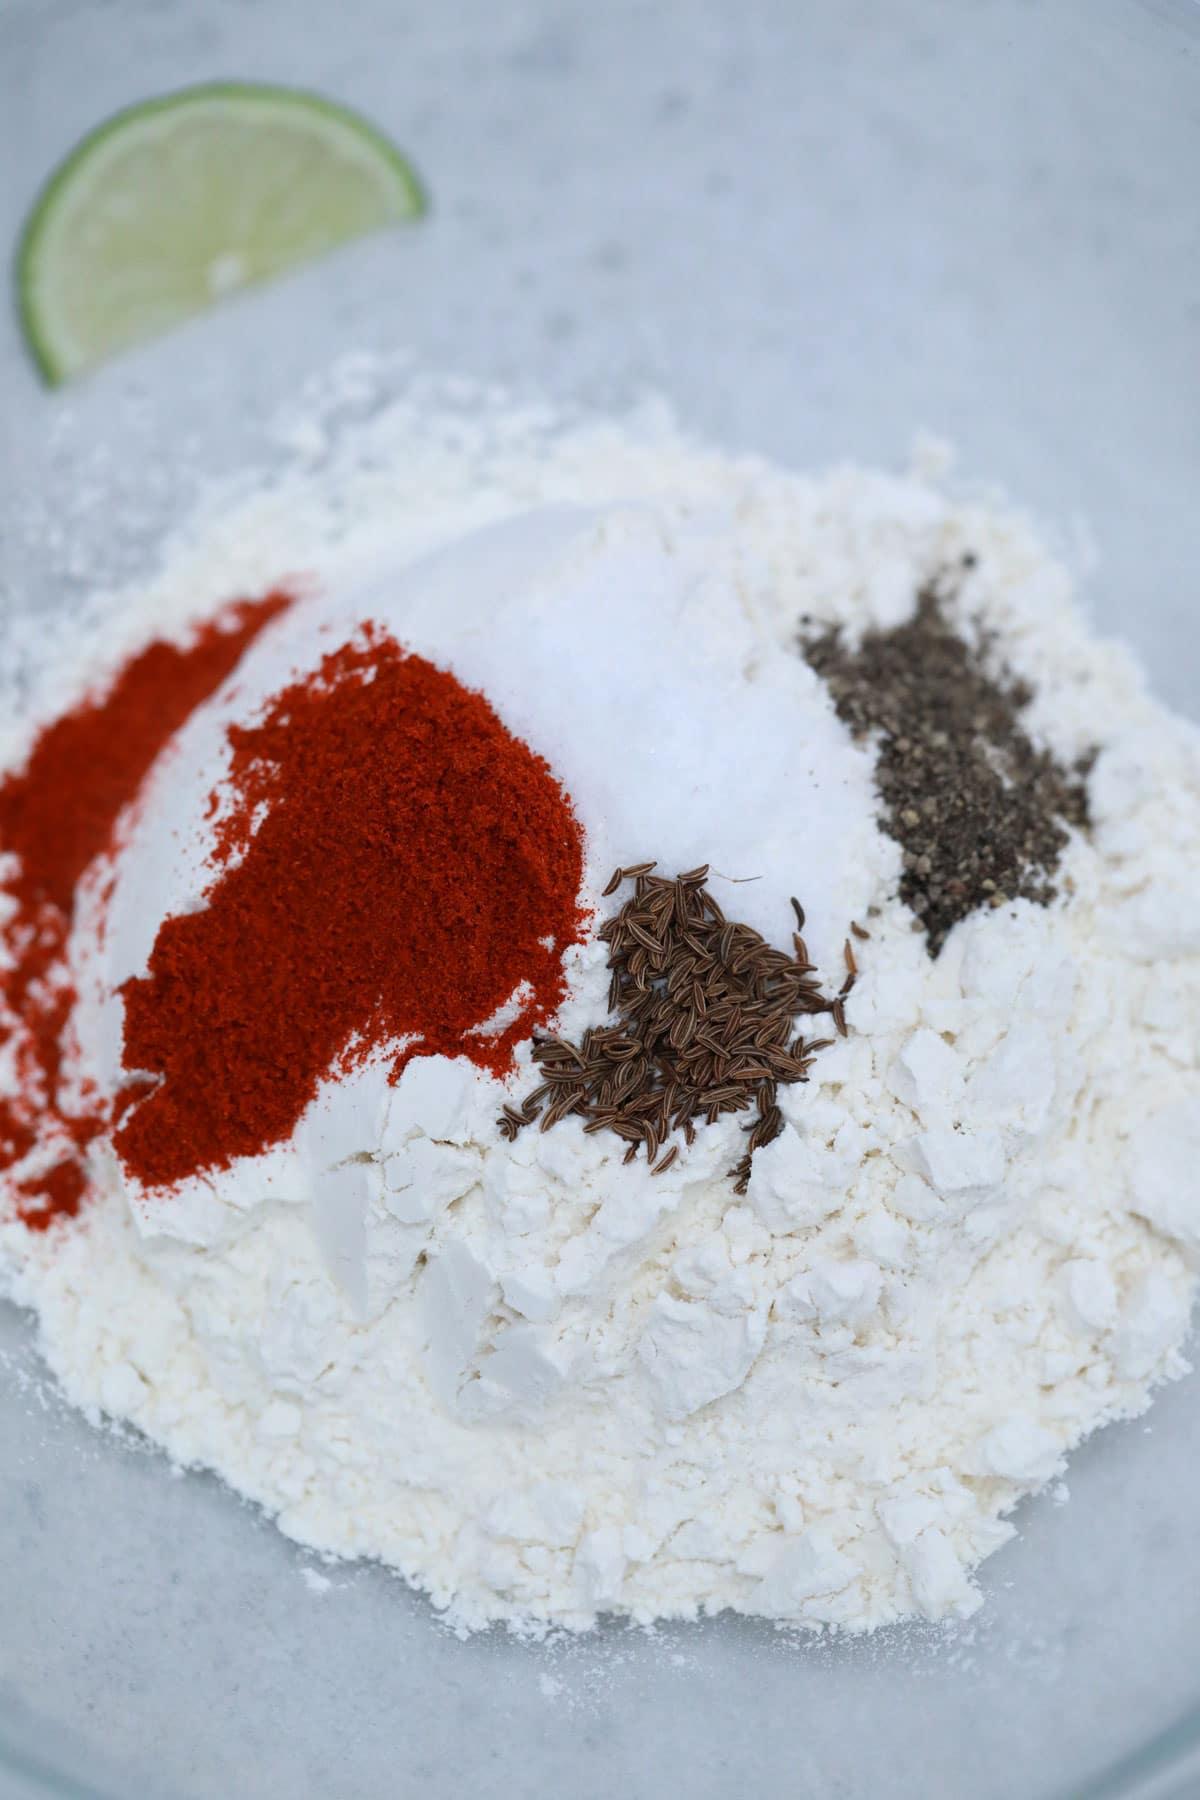 Tempura batter dry ingredients in bowl